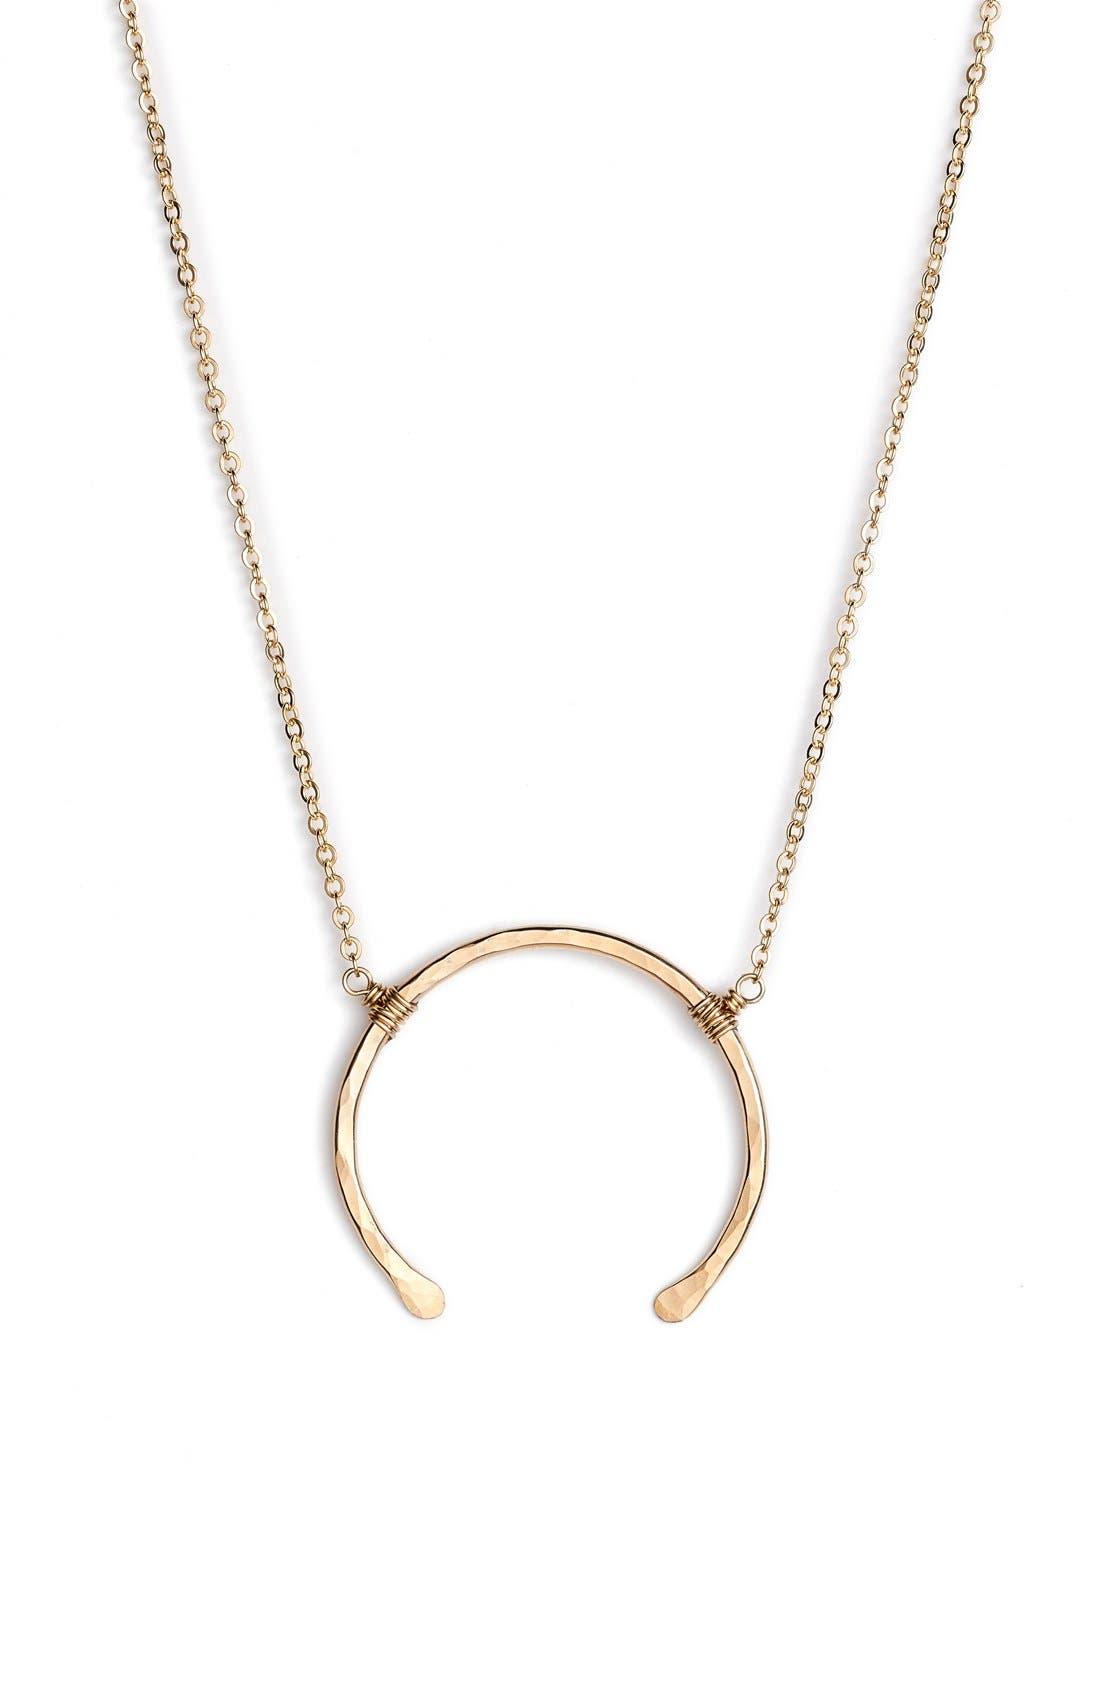 Alternate Image 1 Selected - Nashelle 'Imogen' Crescent Pendant Necklace